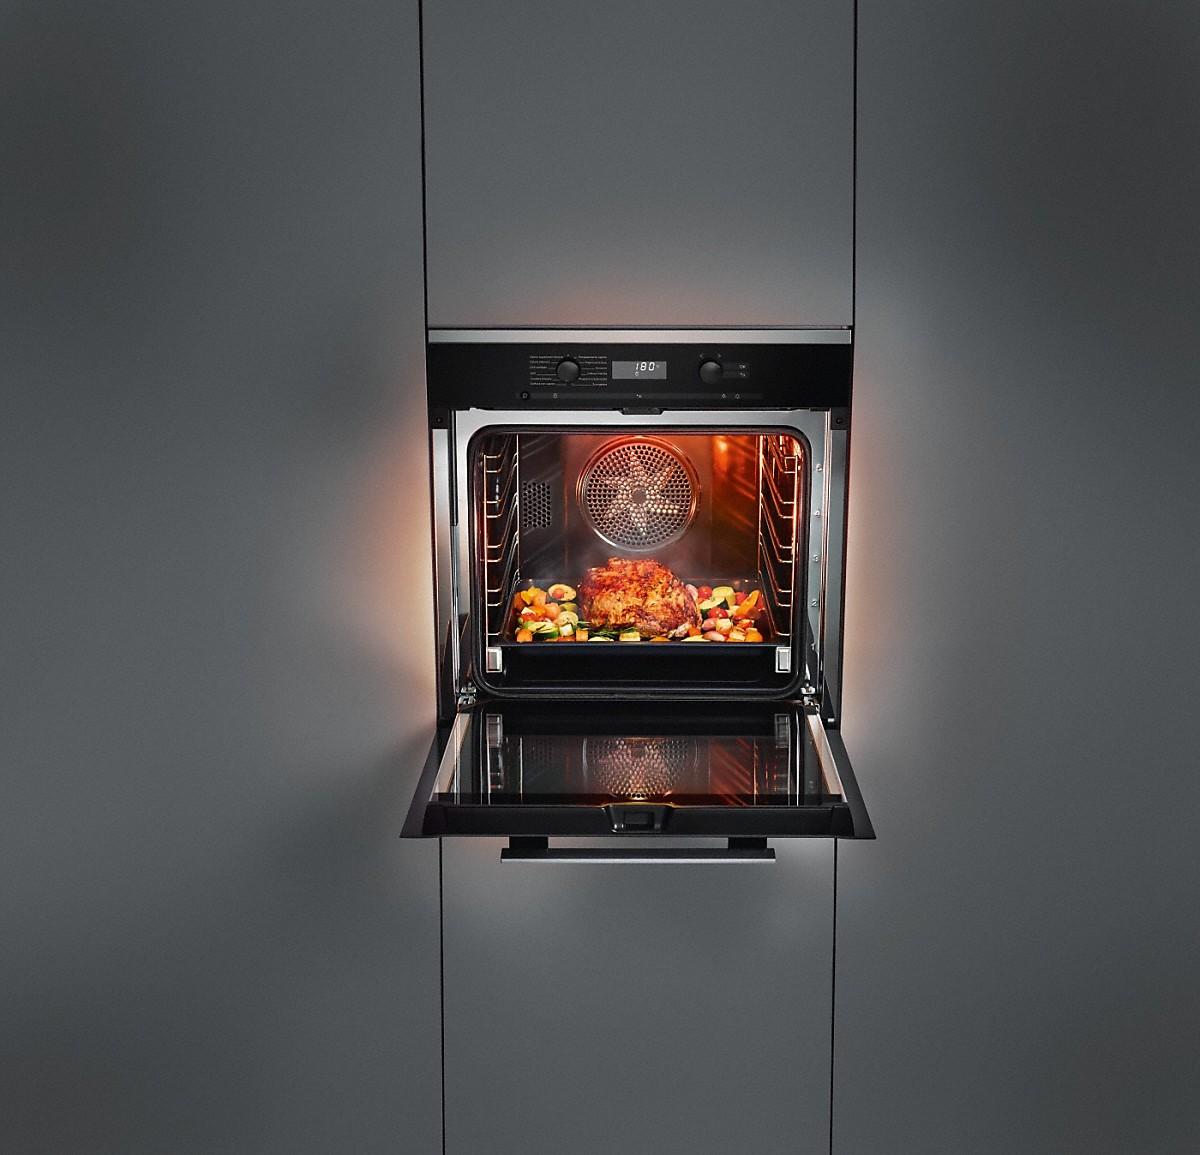 miele forni h 6267 b forni. Black Bedroom Furniture Sets. Home Design Ideas